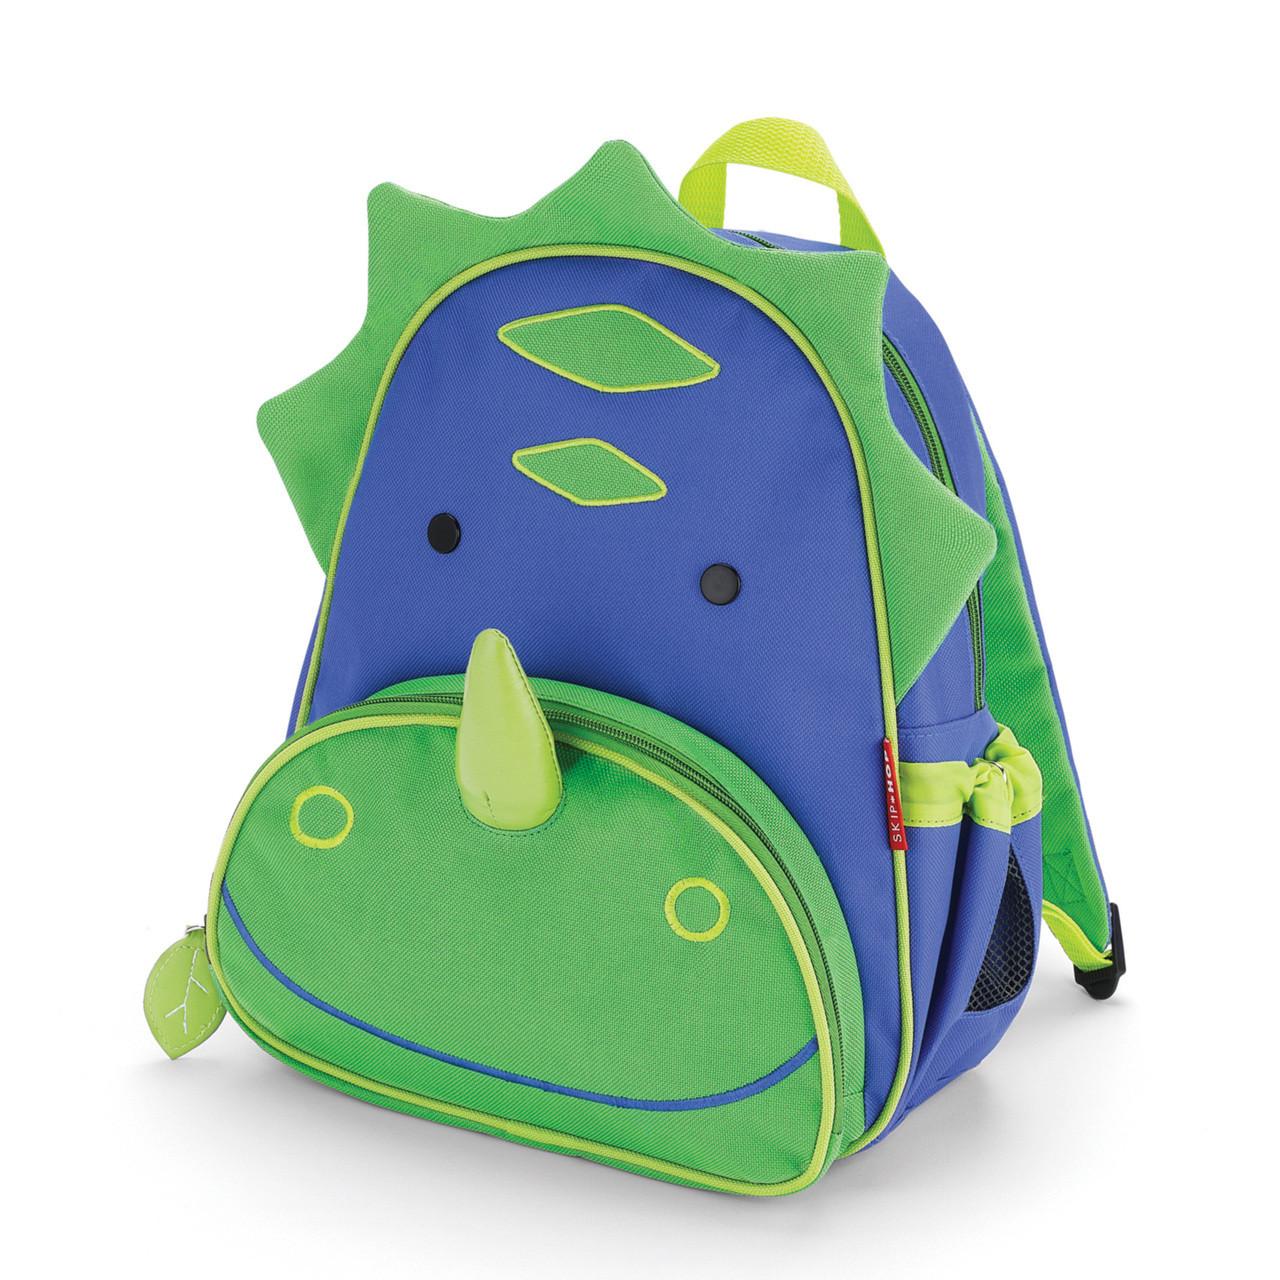 Childrens Backpacks - Skip Hop Zoo Pack - Dinosaur 9528d44b84